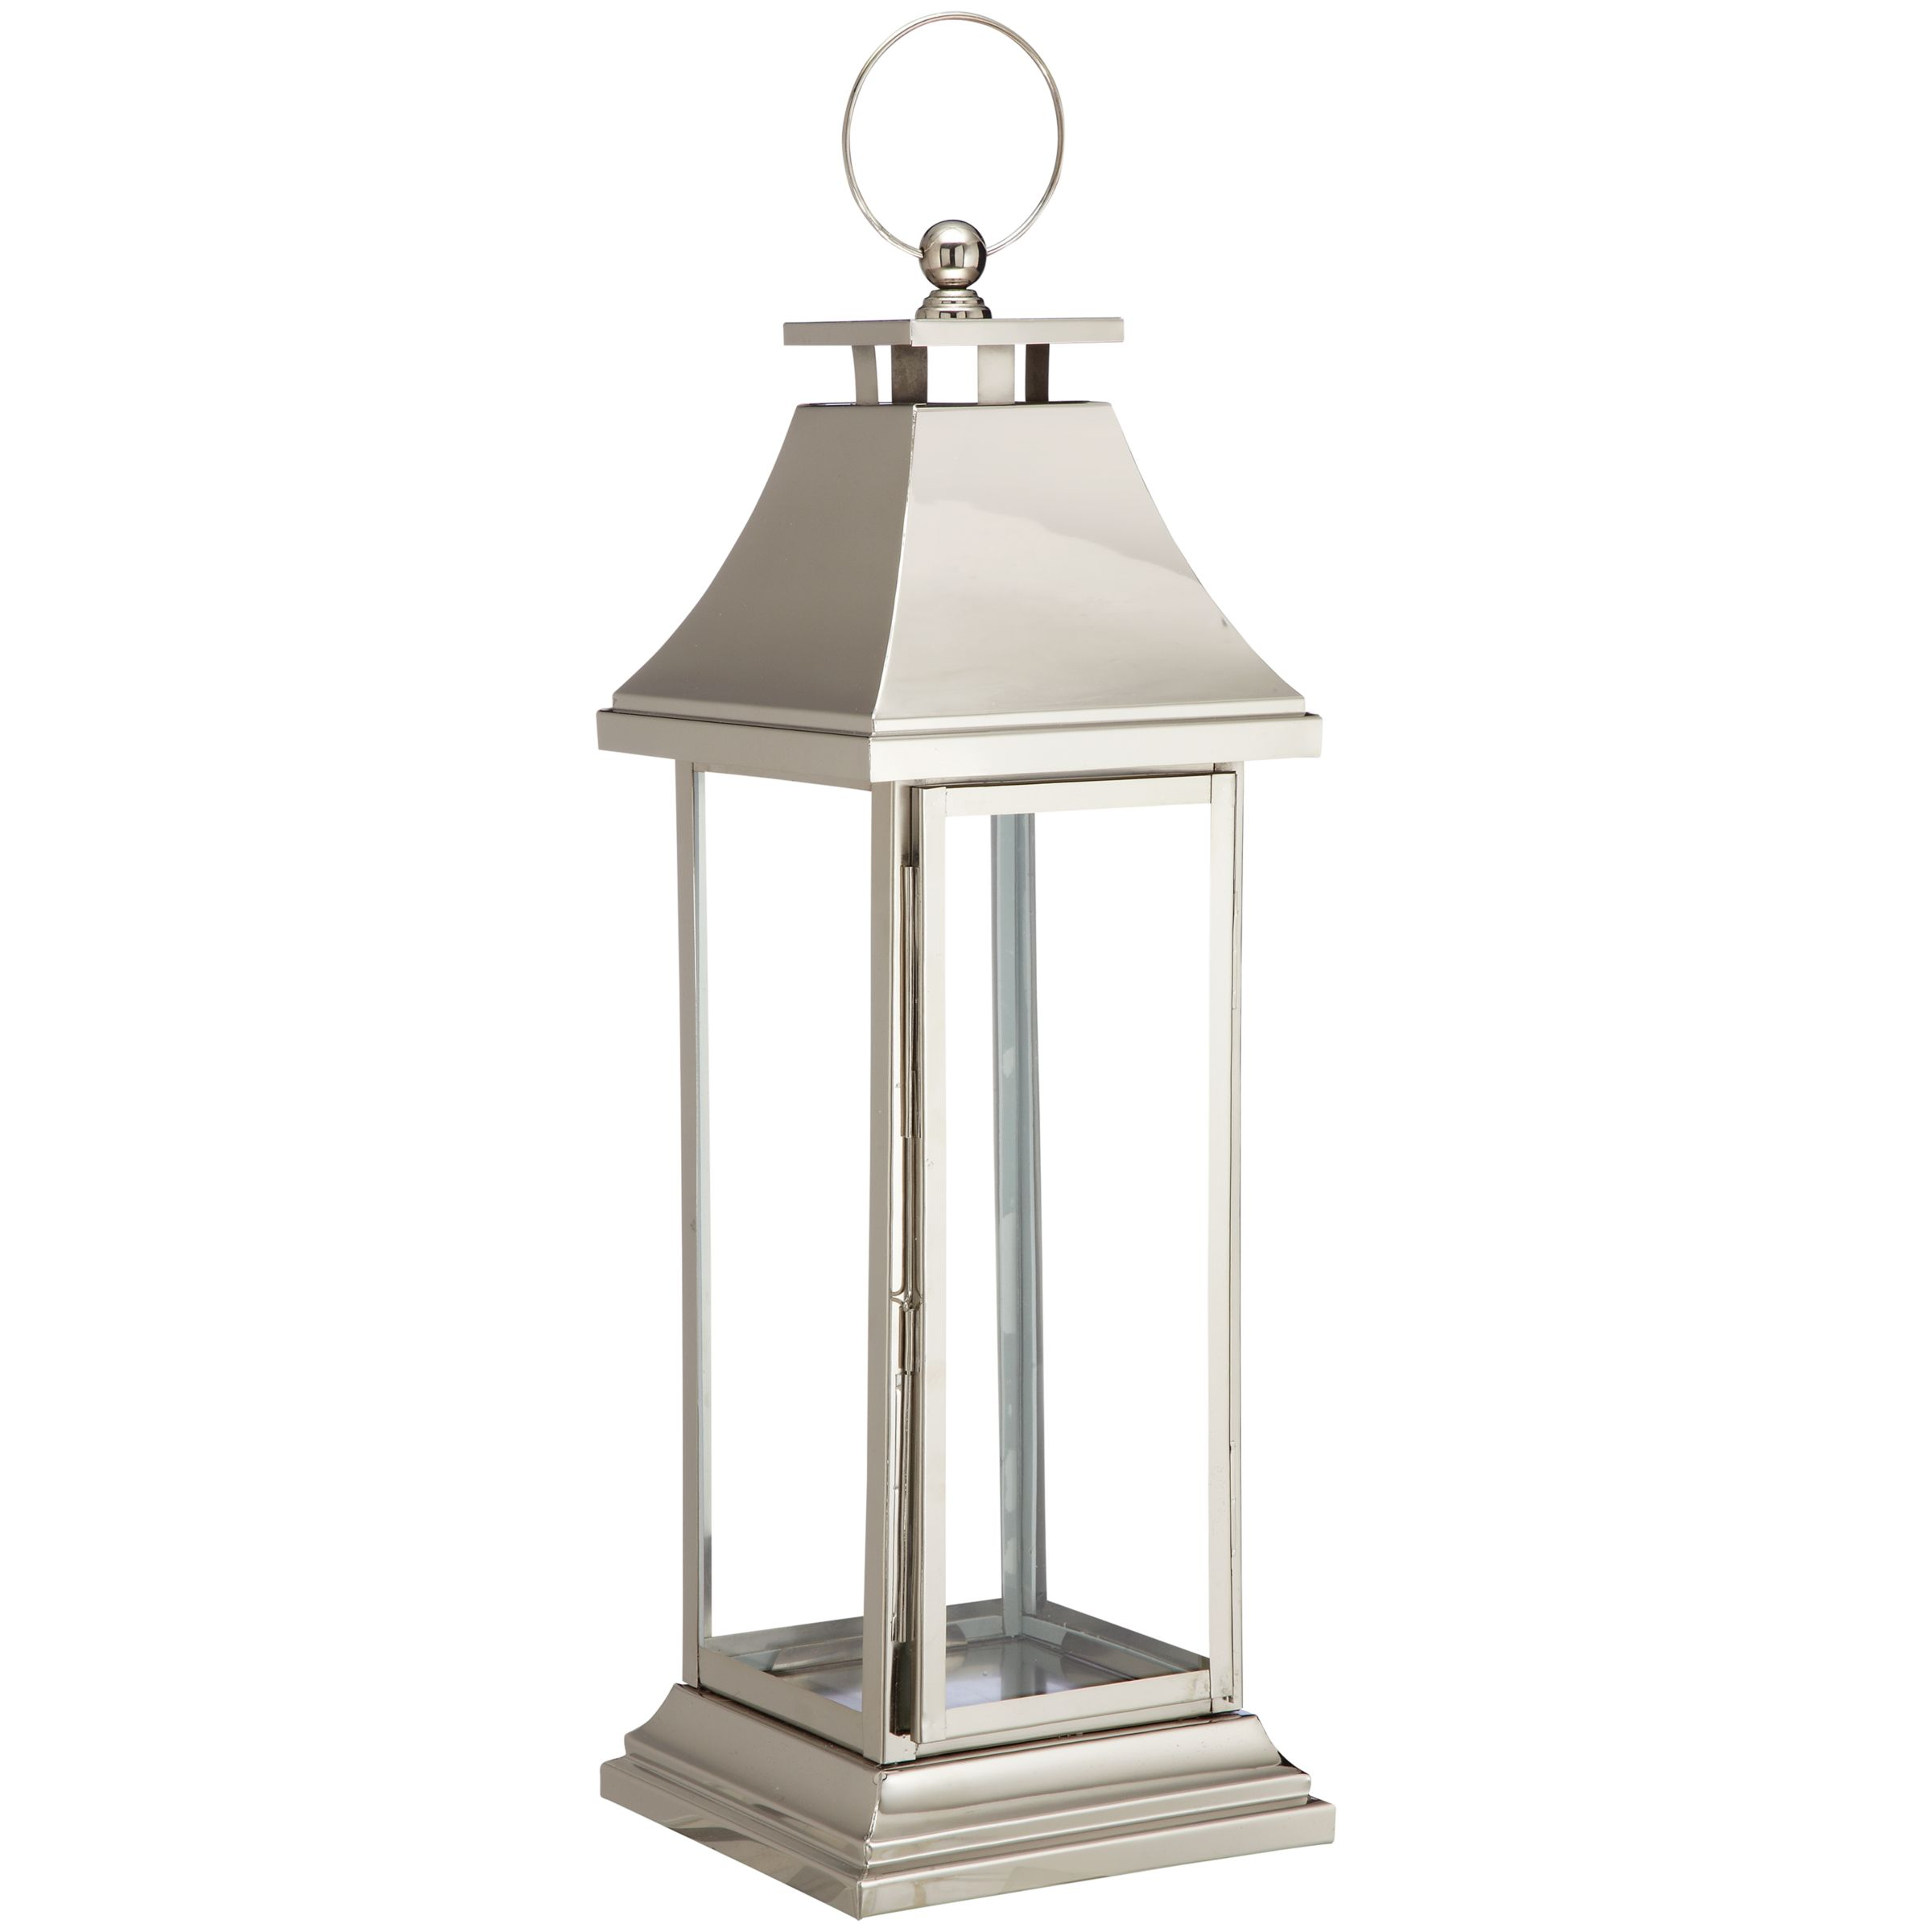 John Lewis Victoria Lantern, H70cm